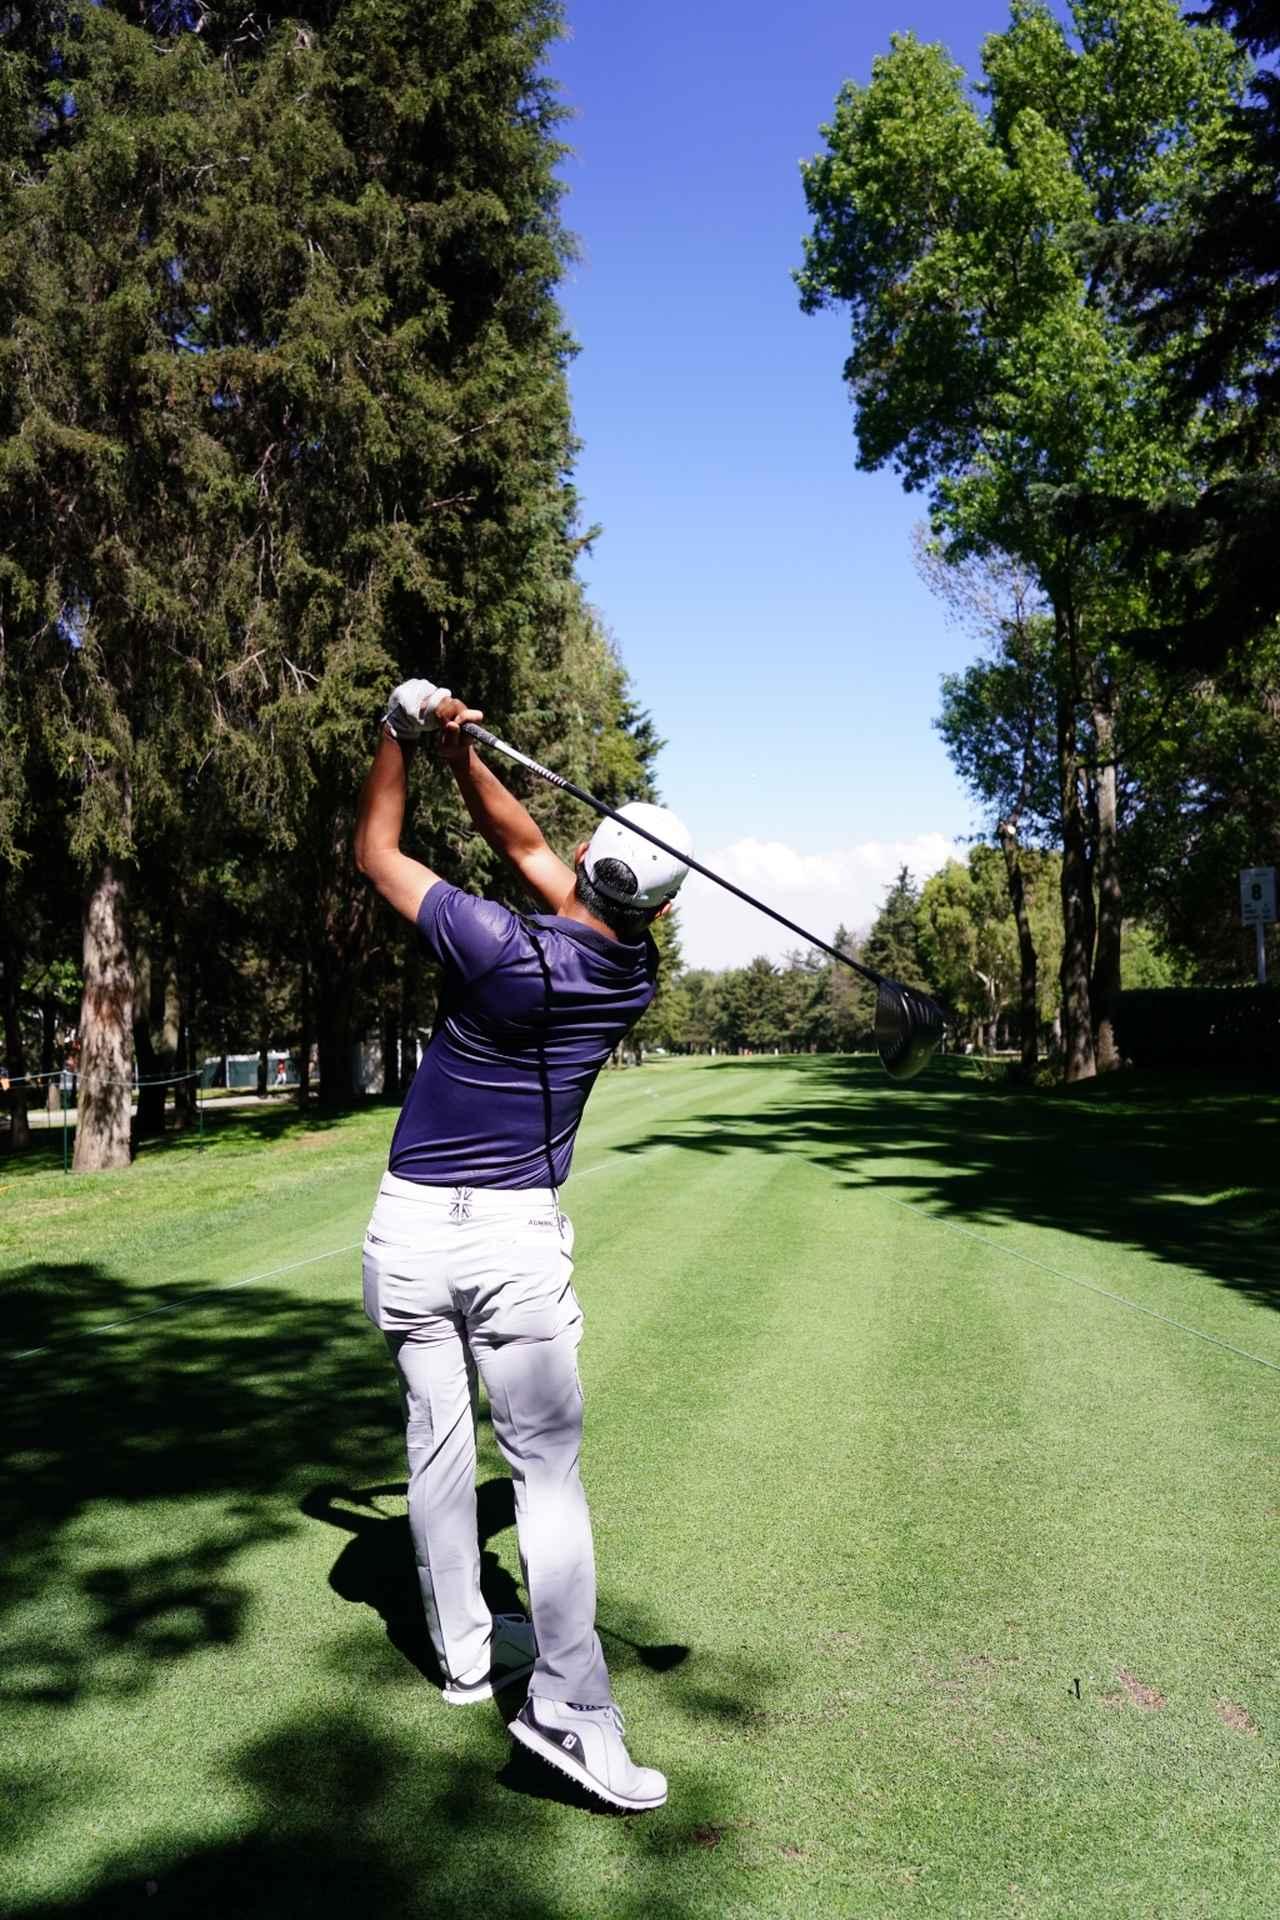 Images : 13番目の画像 - 小平智のドライバー連続写真 - みんなのゴルフダイジェスト